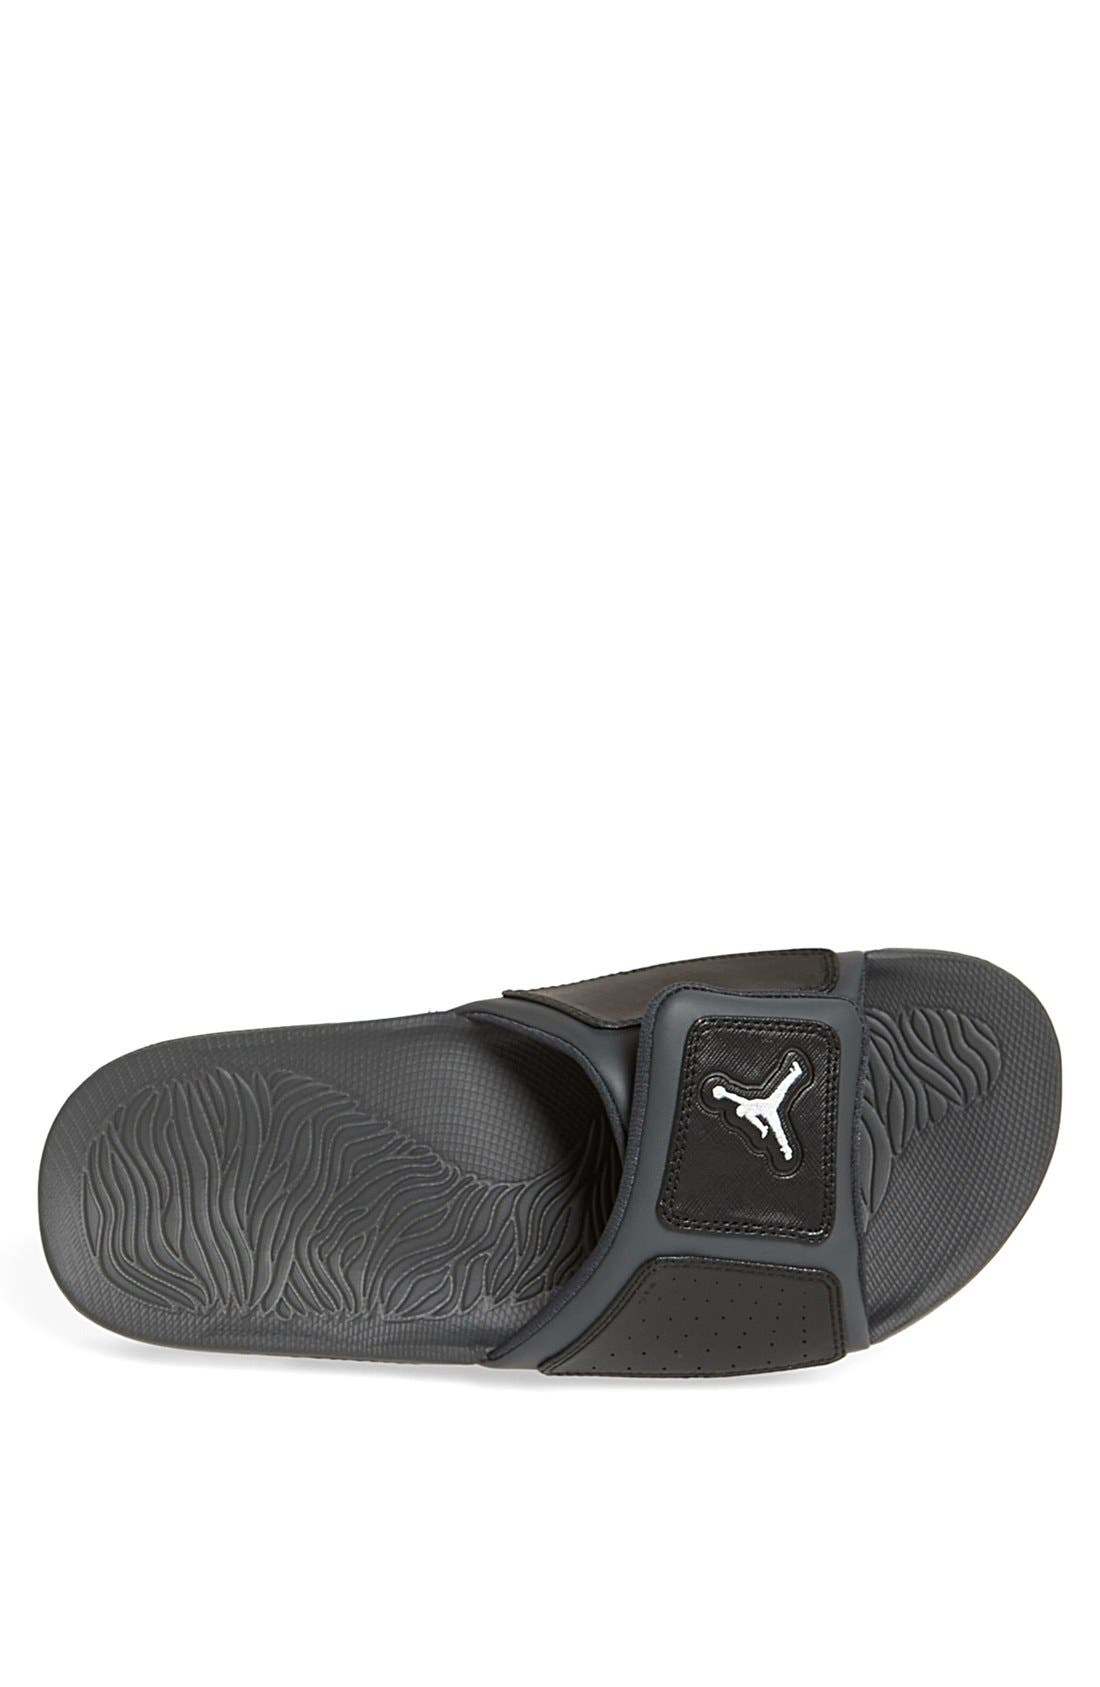 Alternate Image 3  - Nike 'Jordan Hydro 3' Sandal